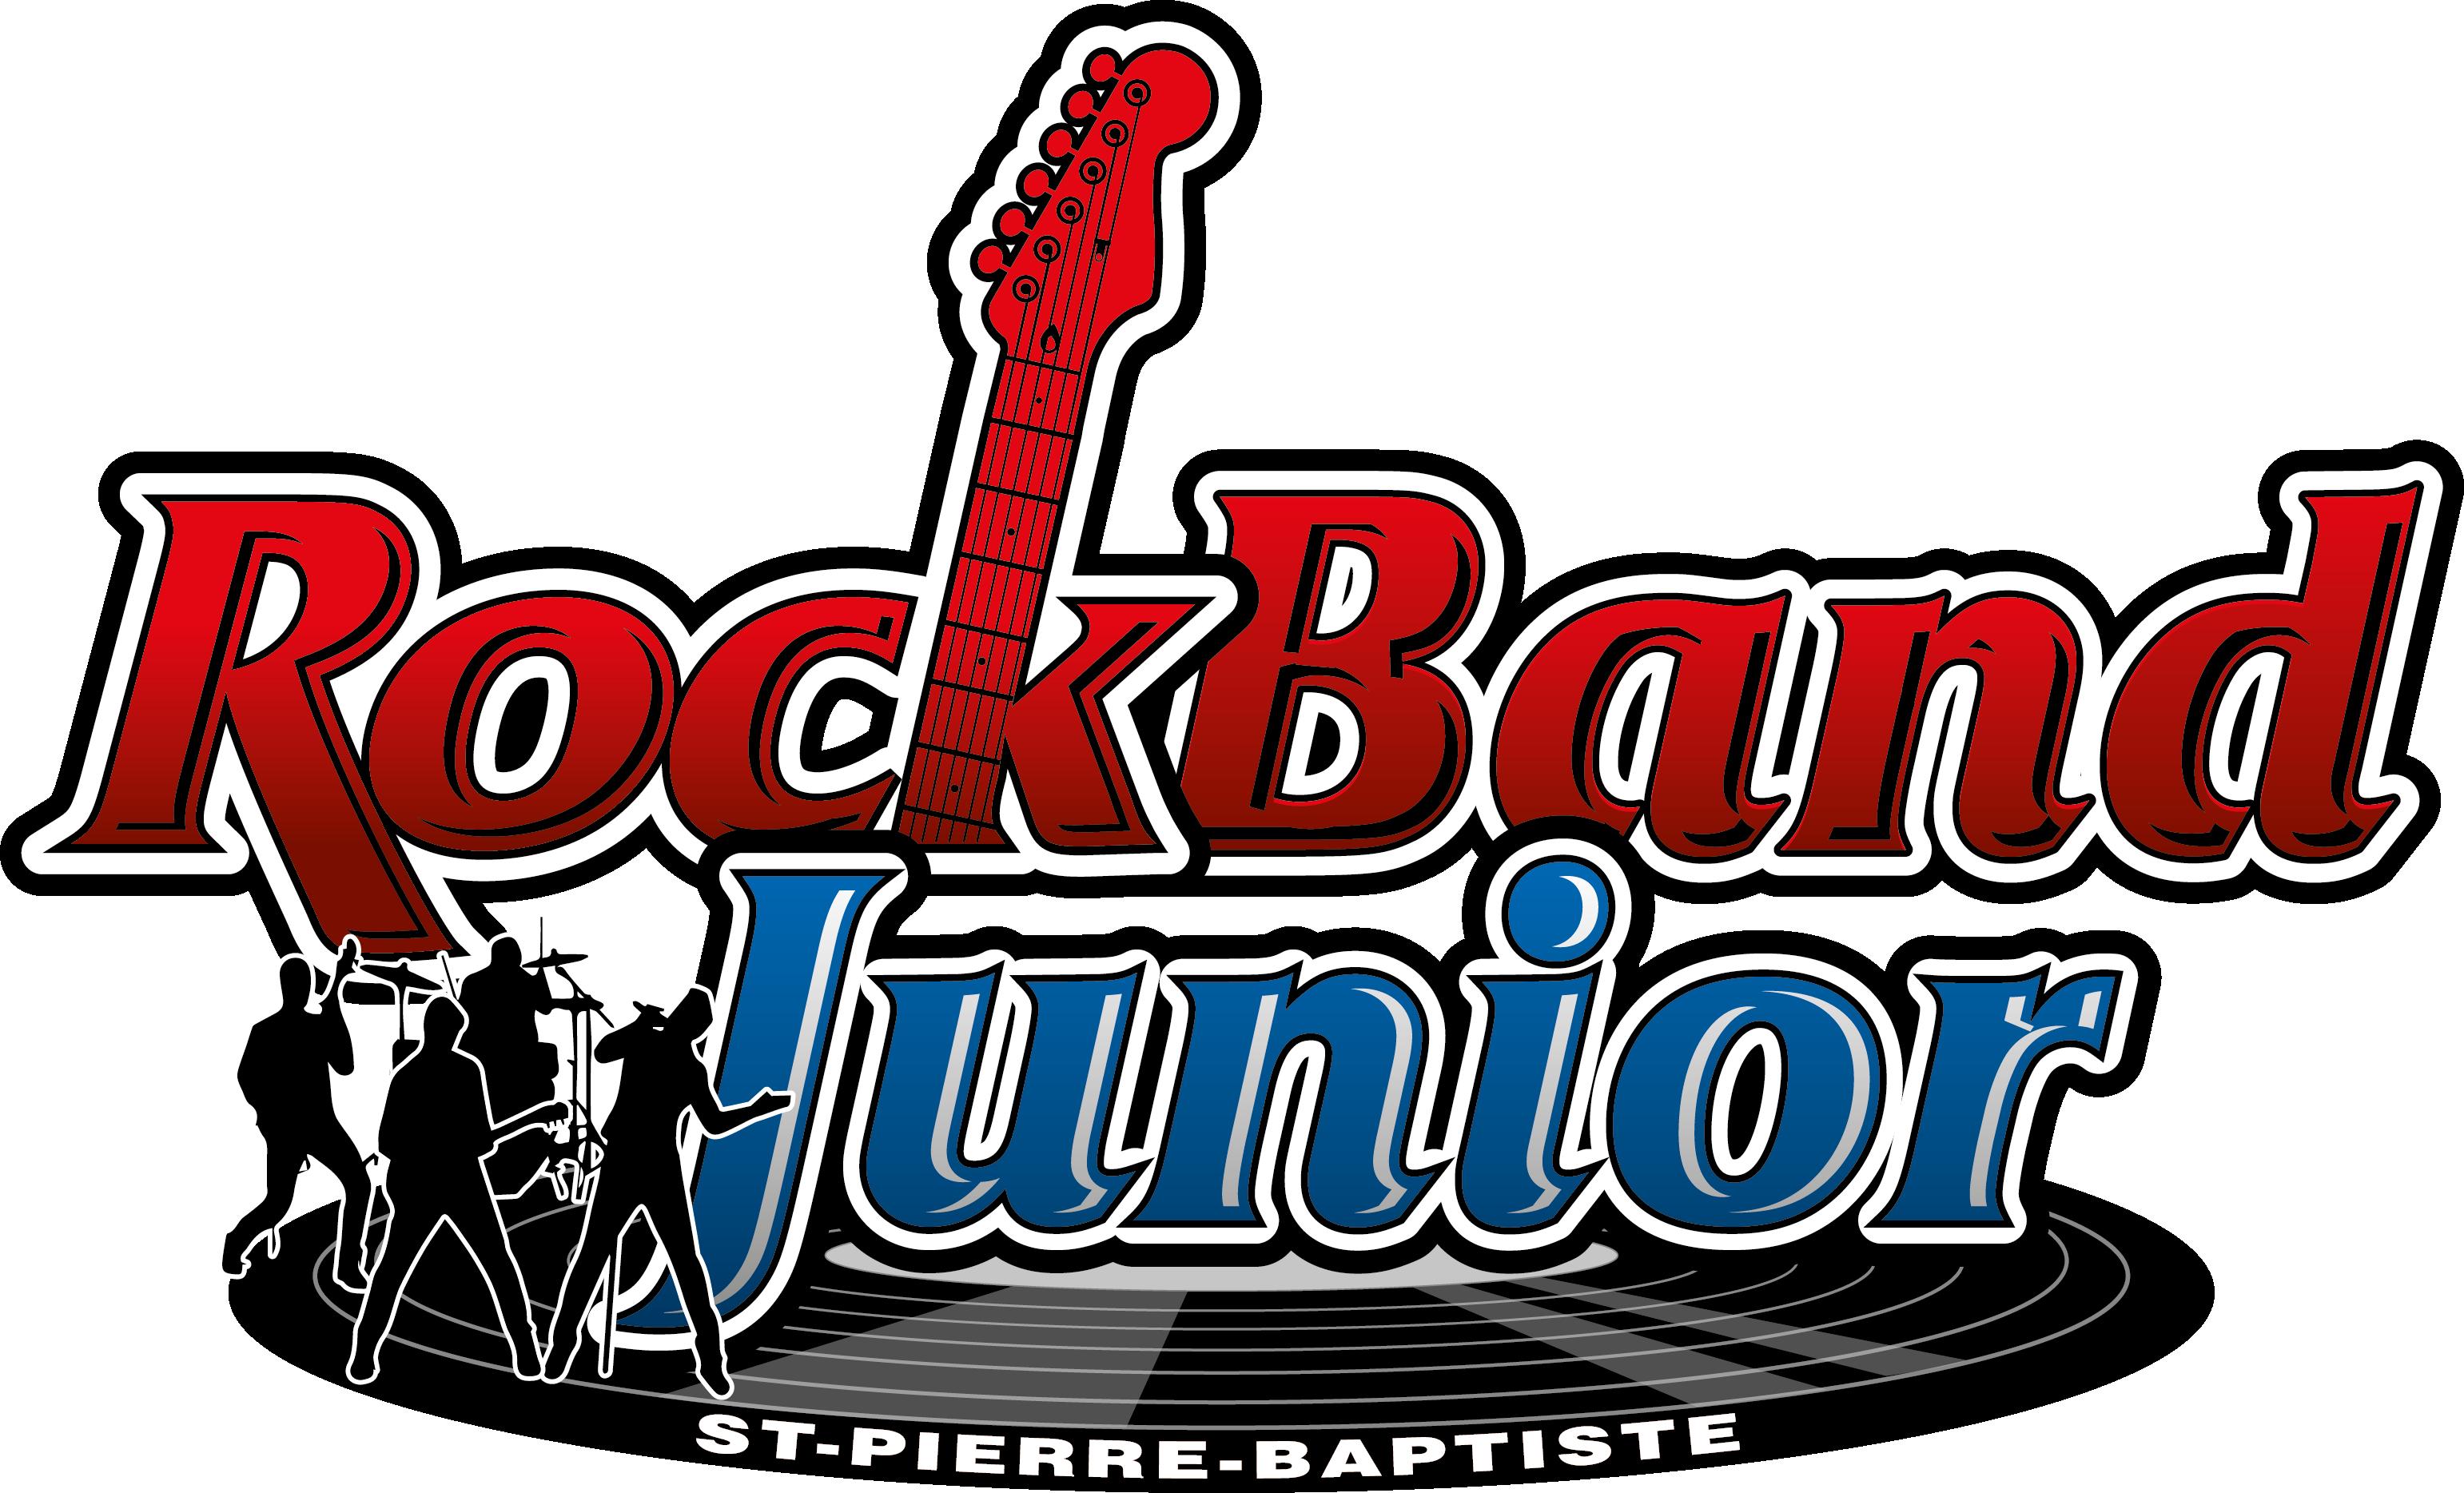 images/Rockband_Junior.png